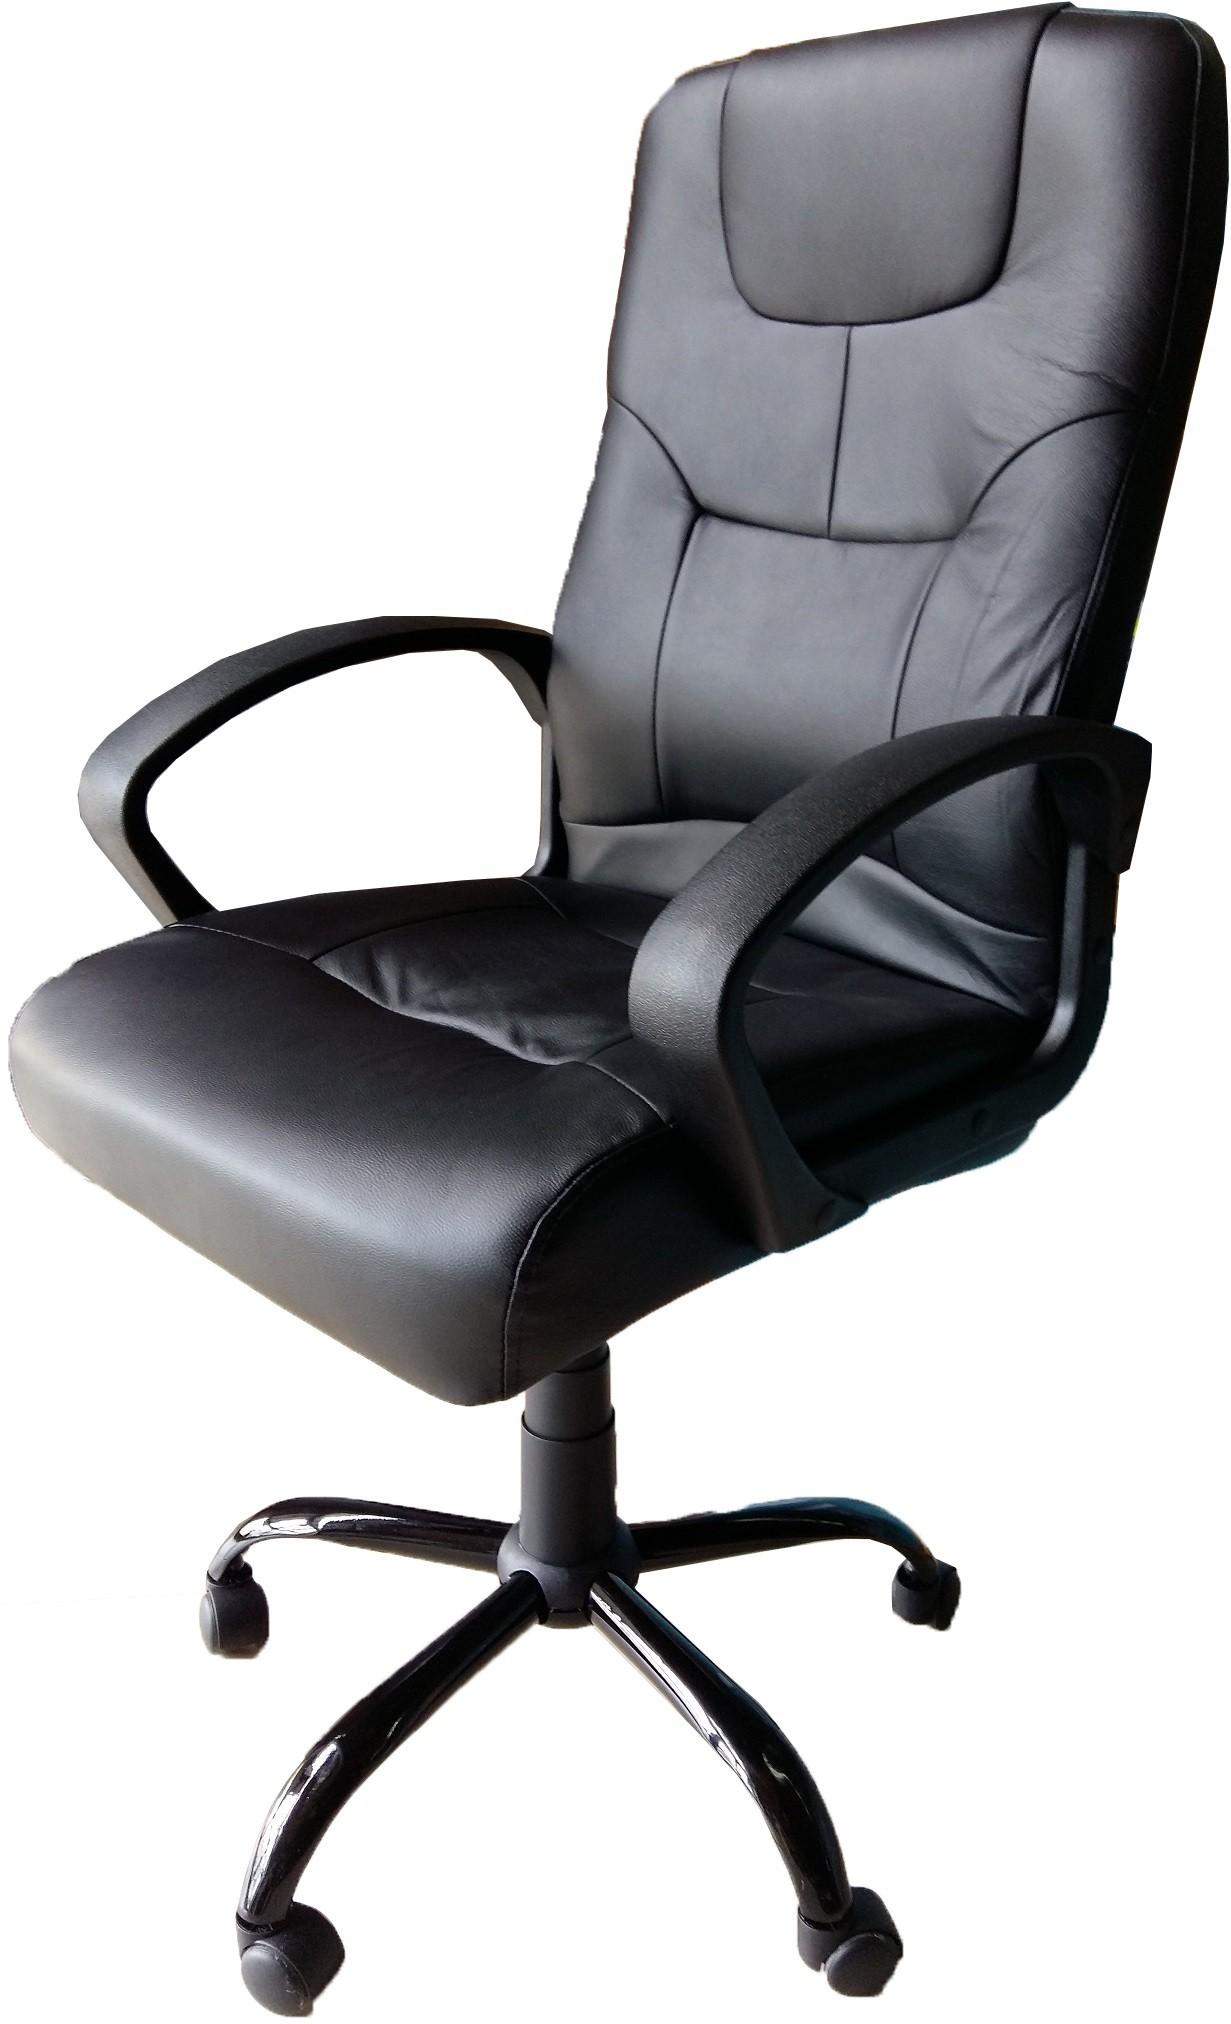 Office Chair SL-9018